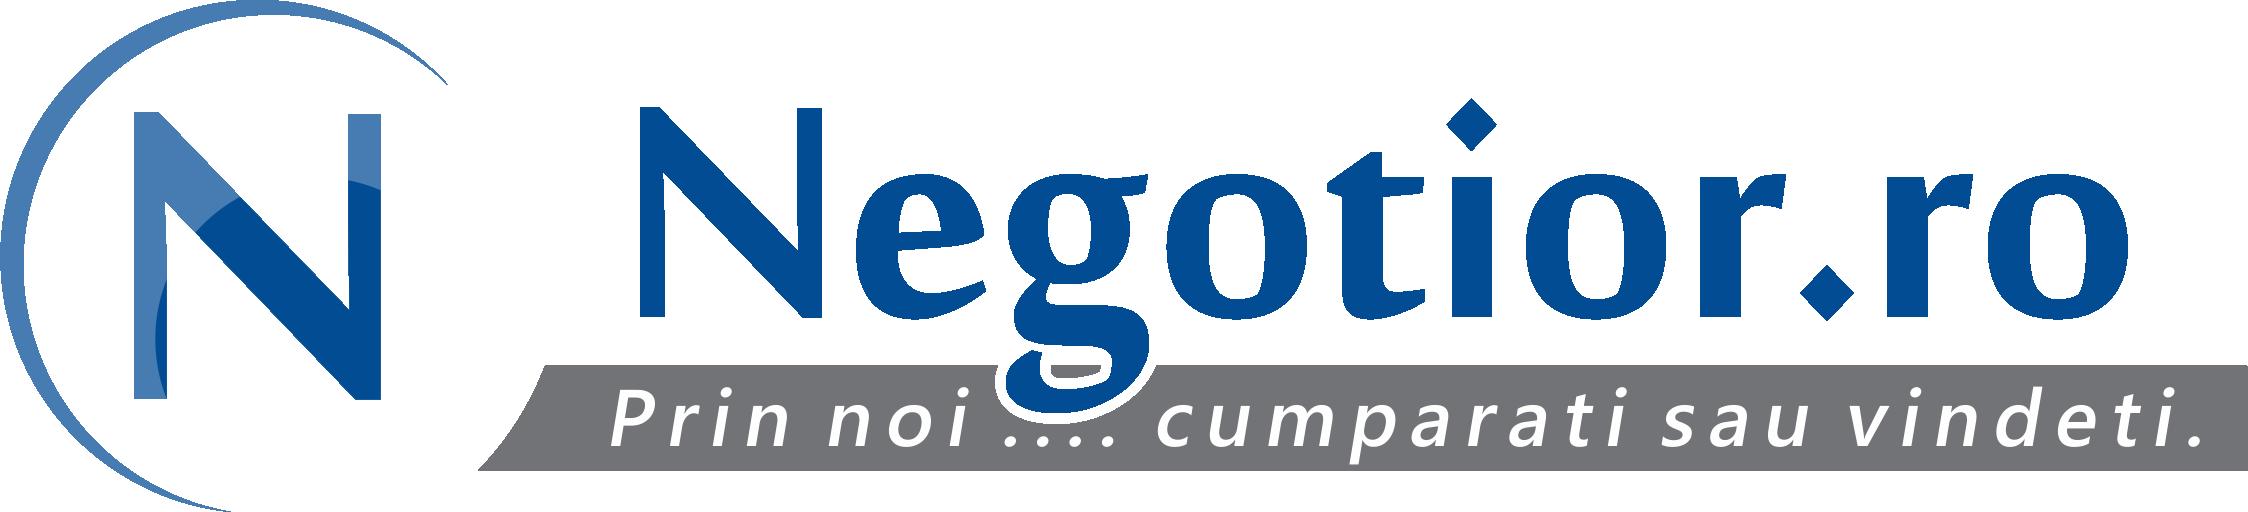 Anunturi gratuite online prin Negotior.ro